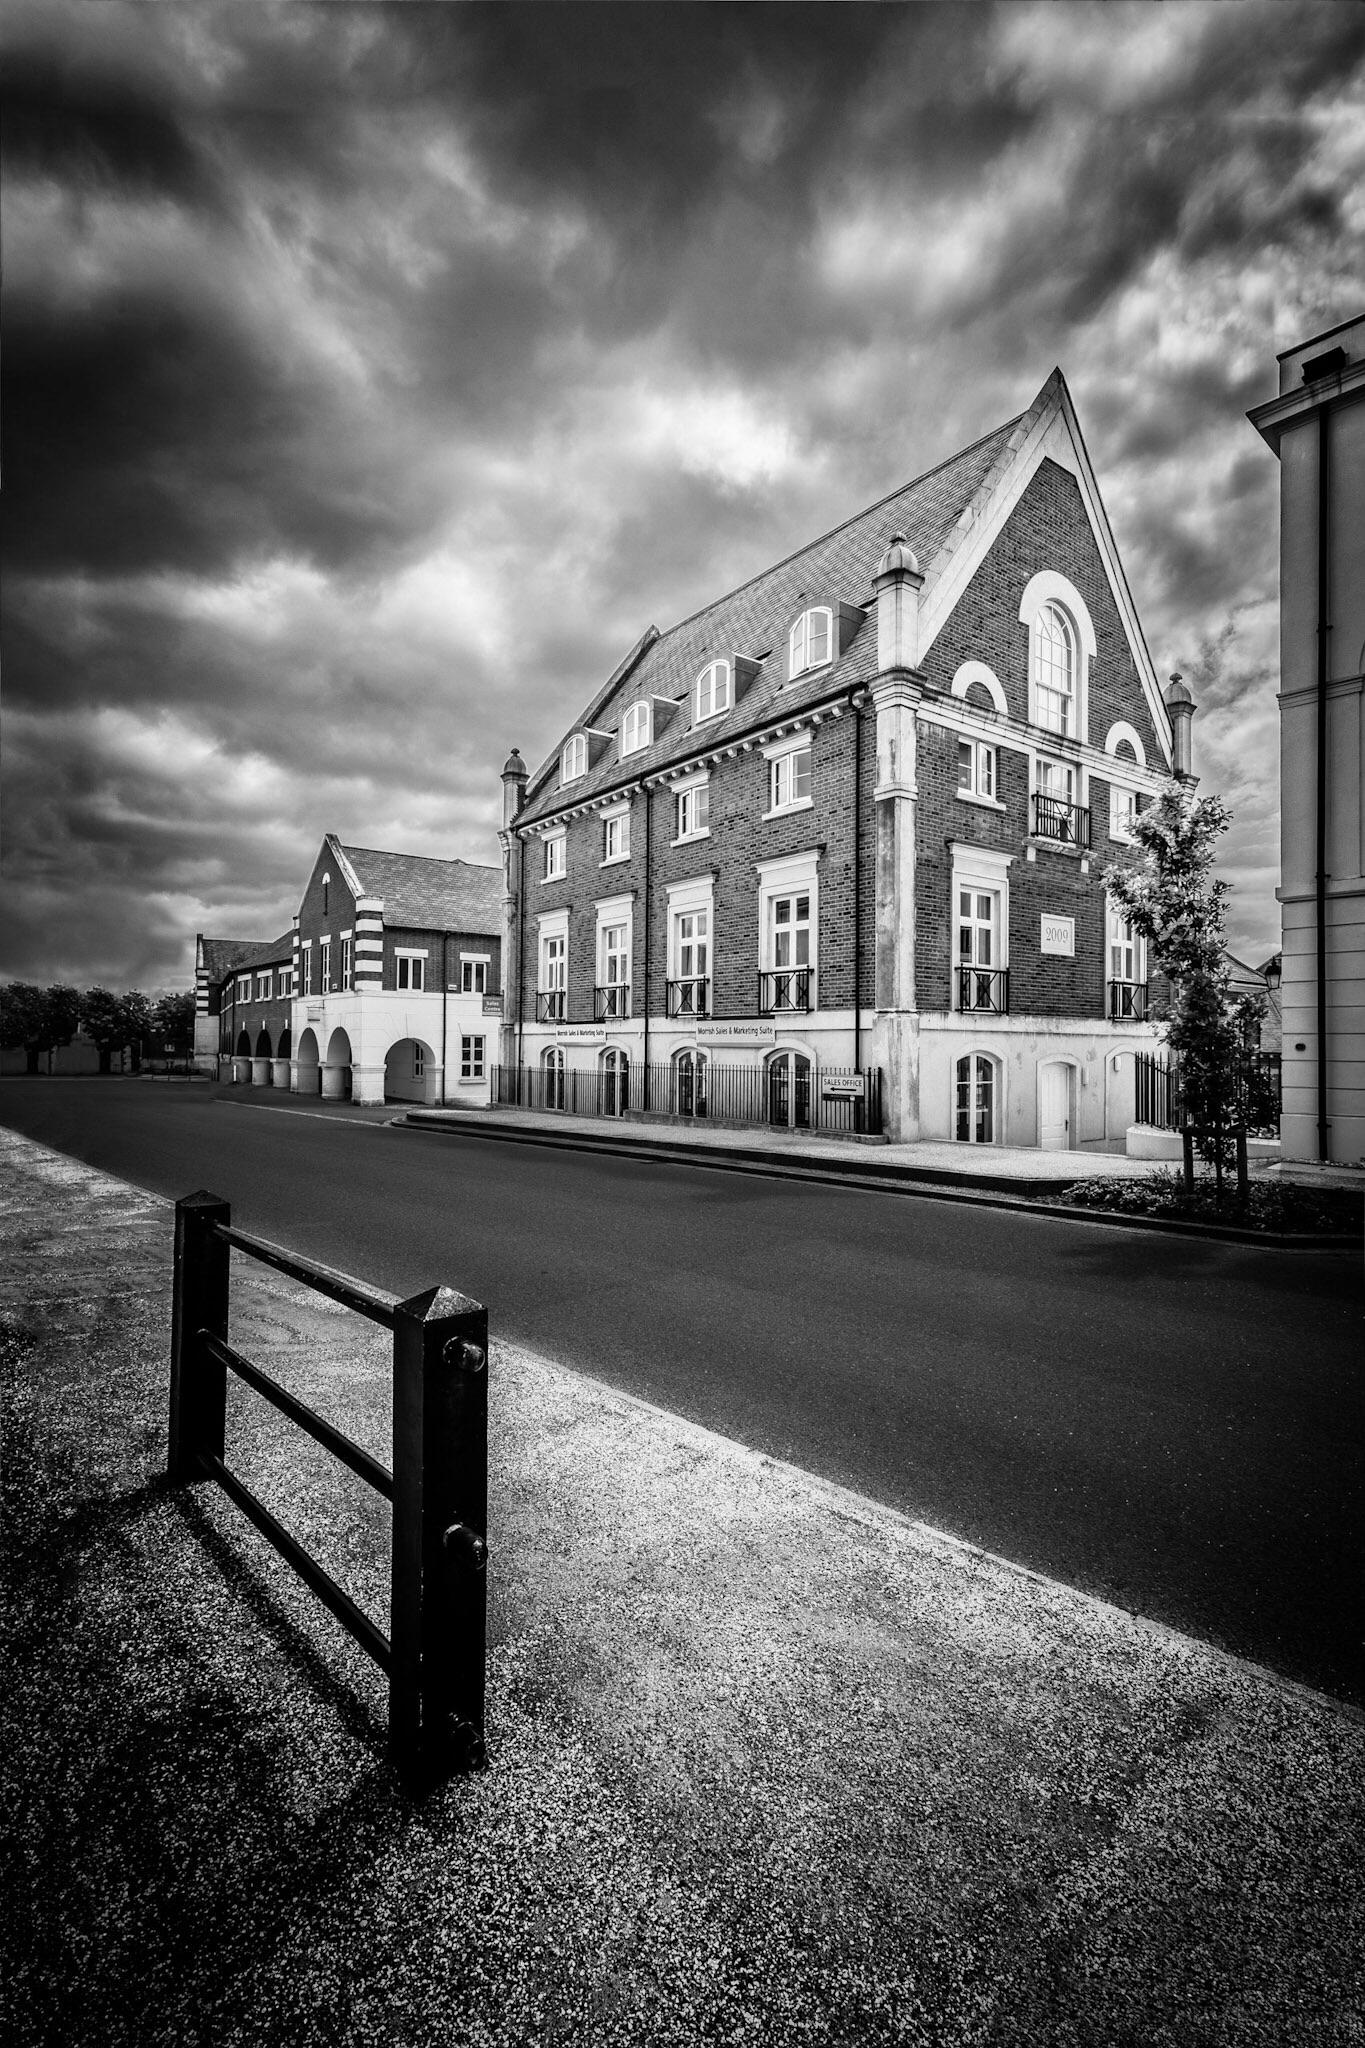 Poundbury architecture photographed for John SImpson Architects